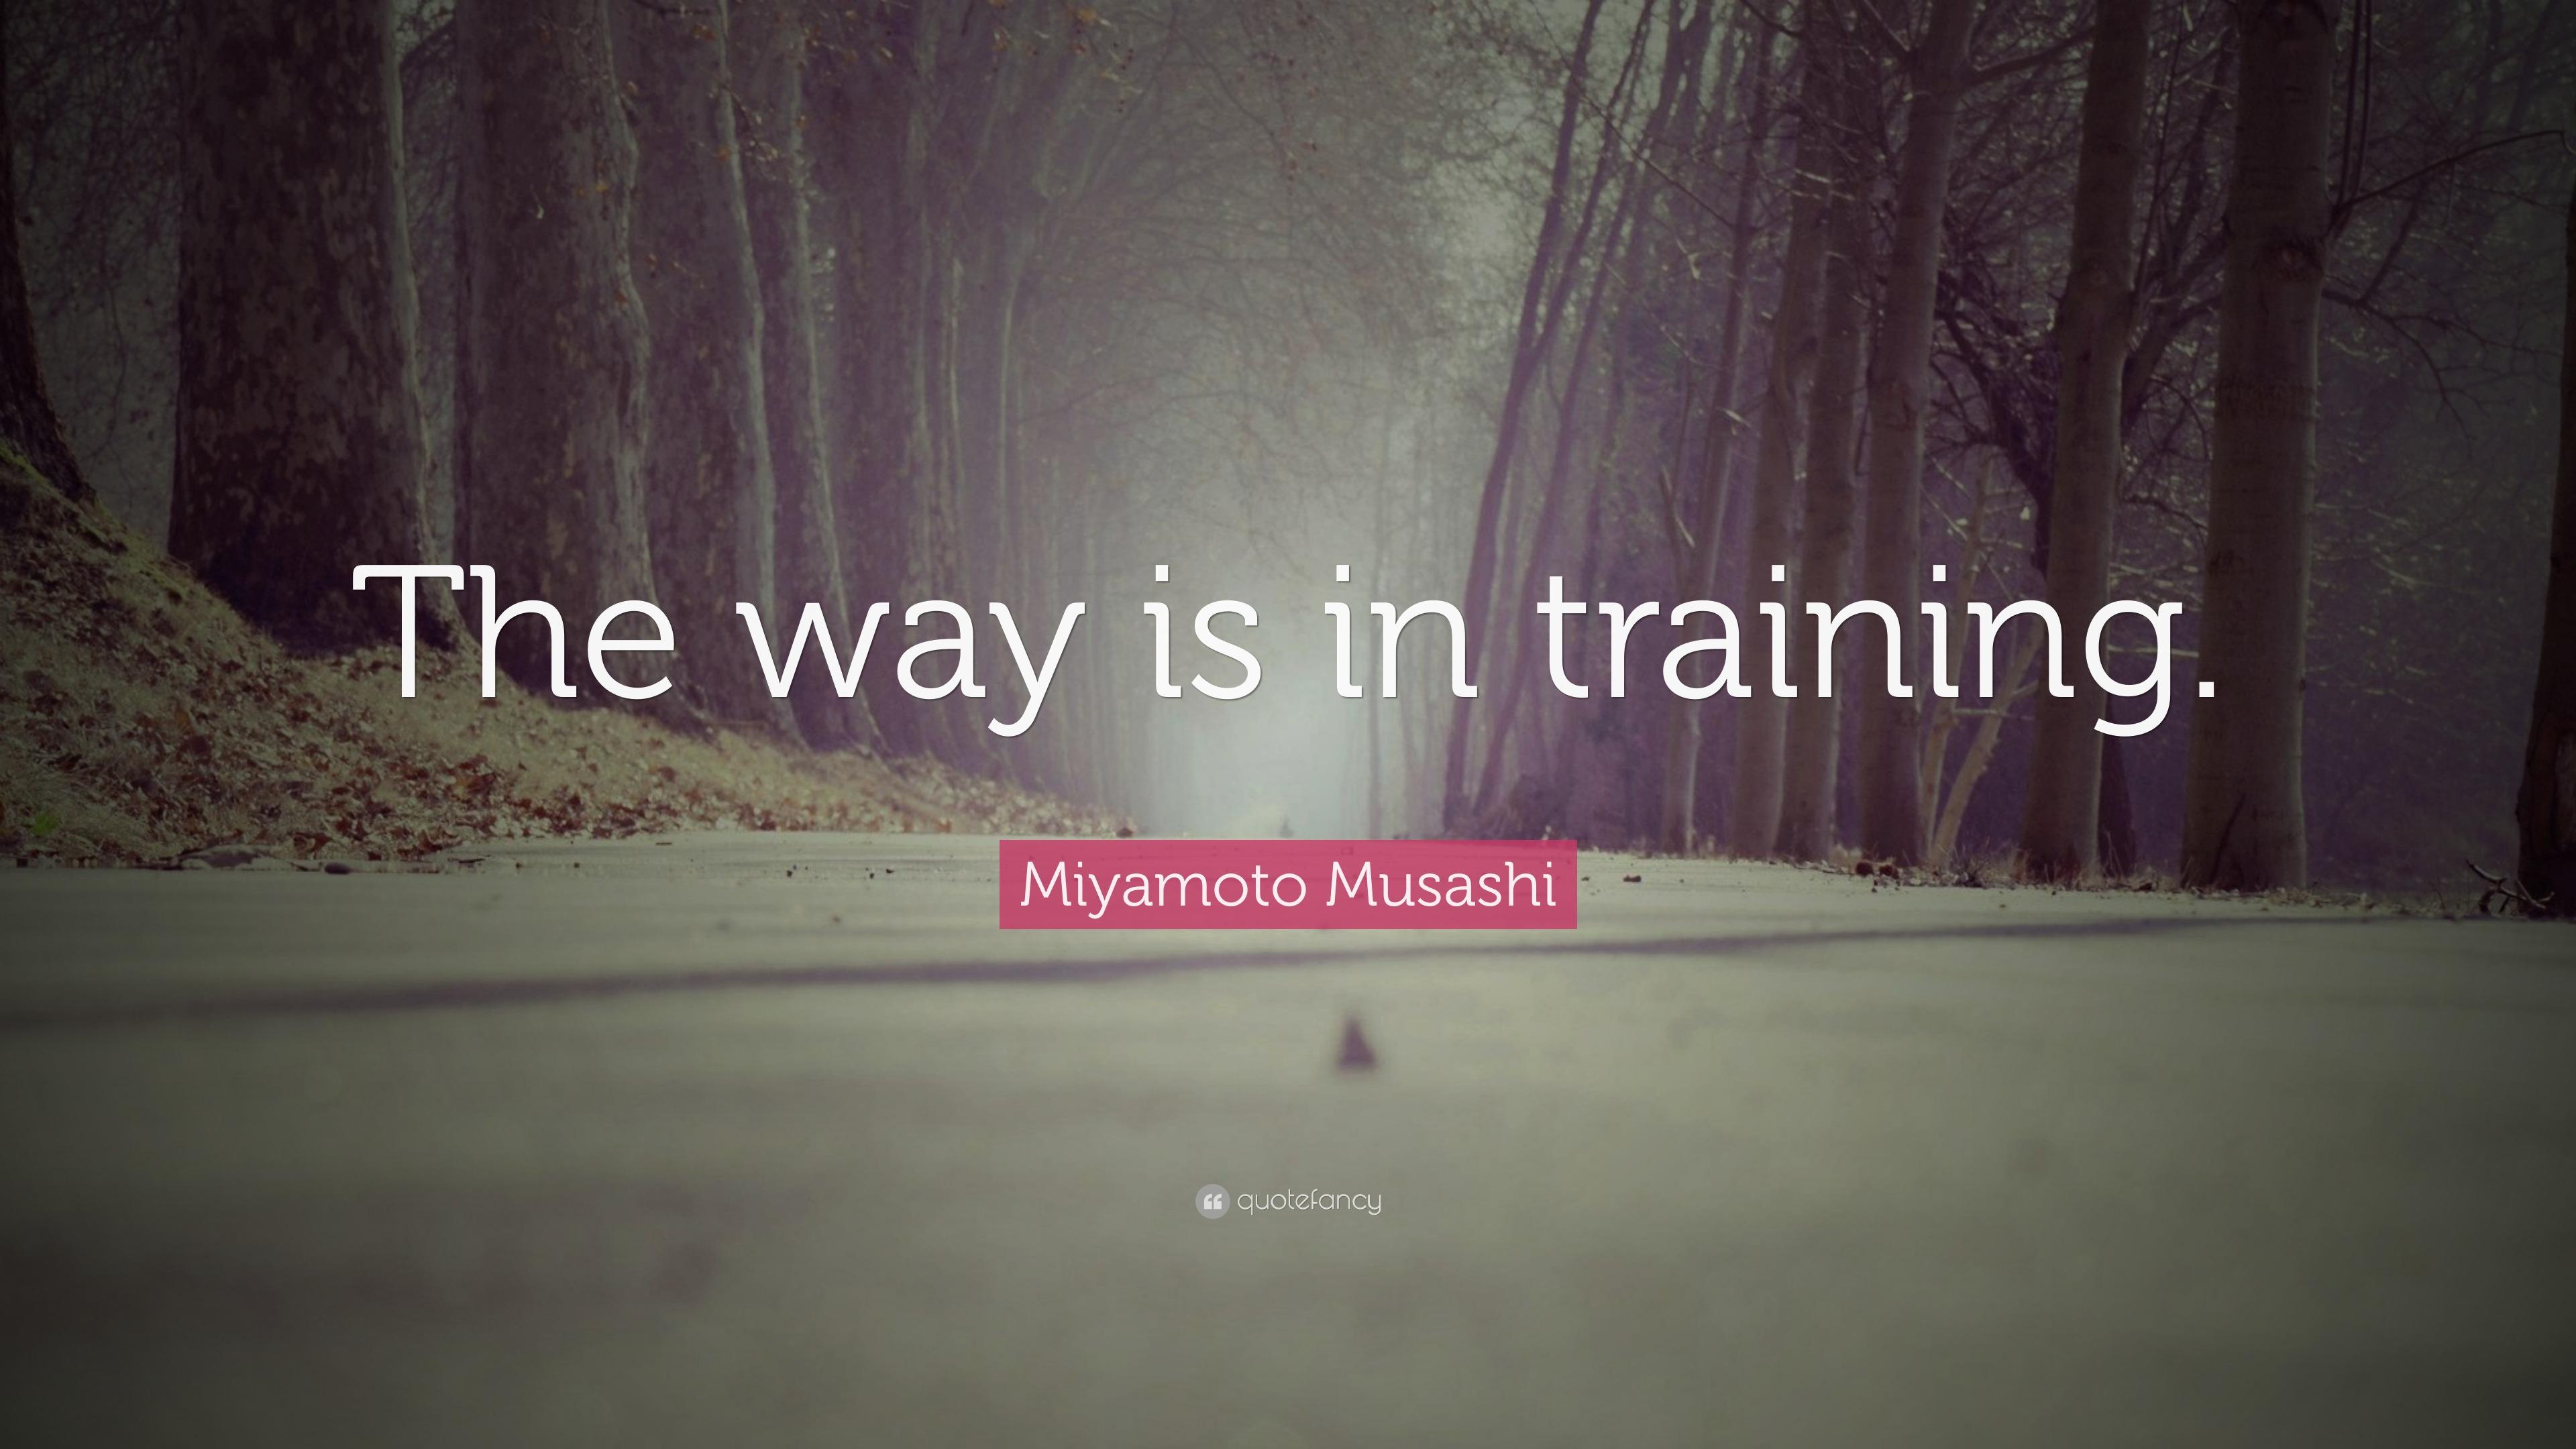 4690911-Miyamoto-Musashi-Quote-The-way-i